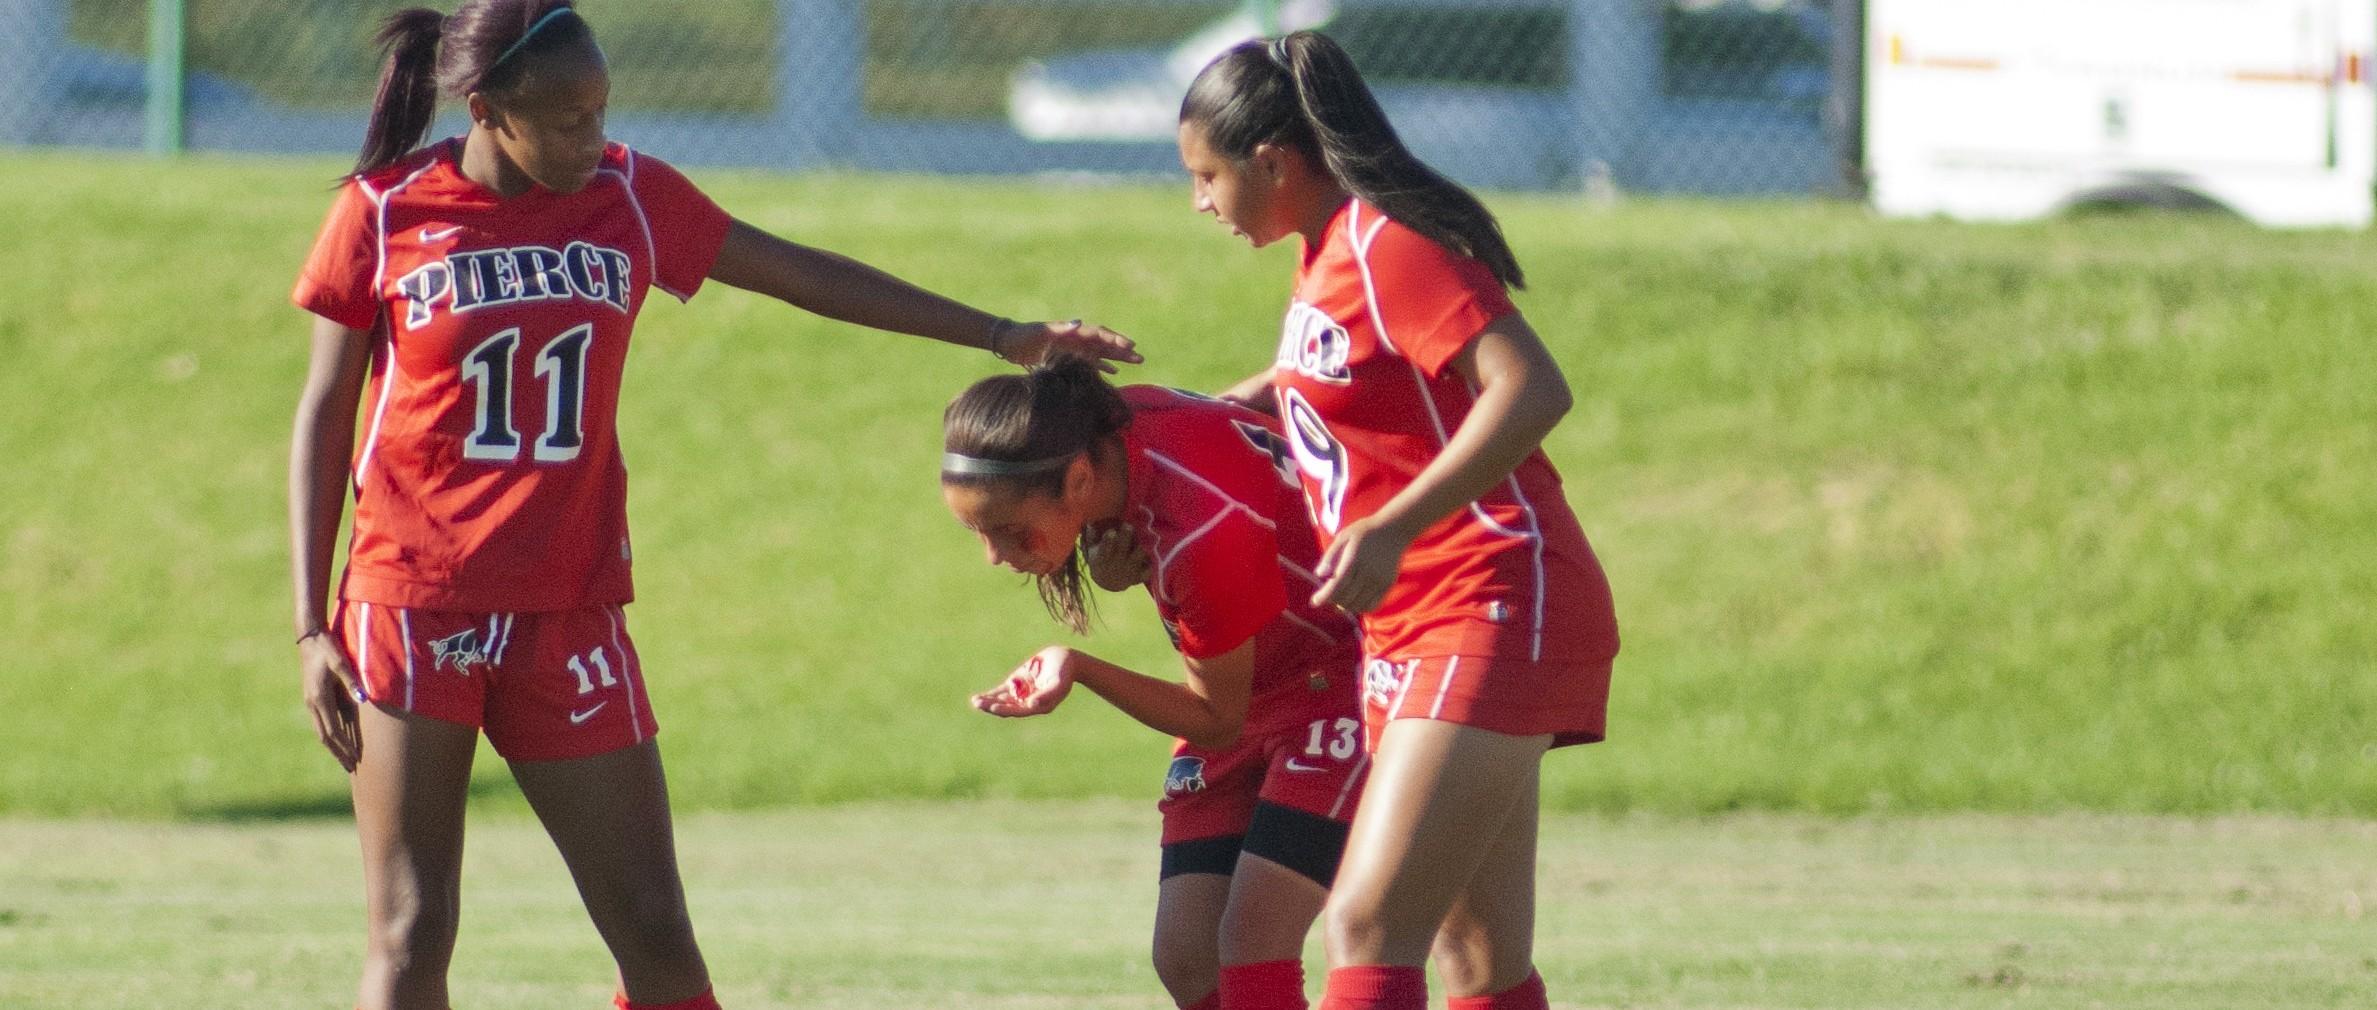 Star player injured in women's soccer win